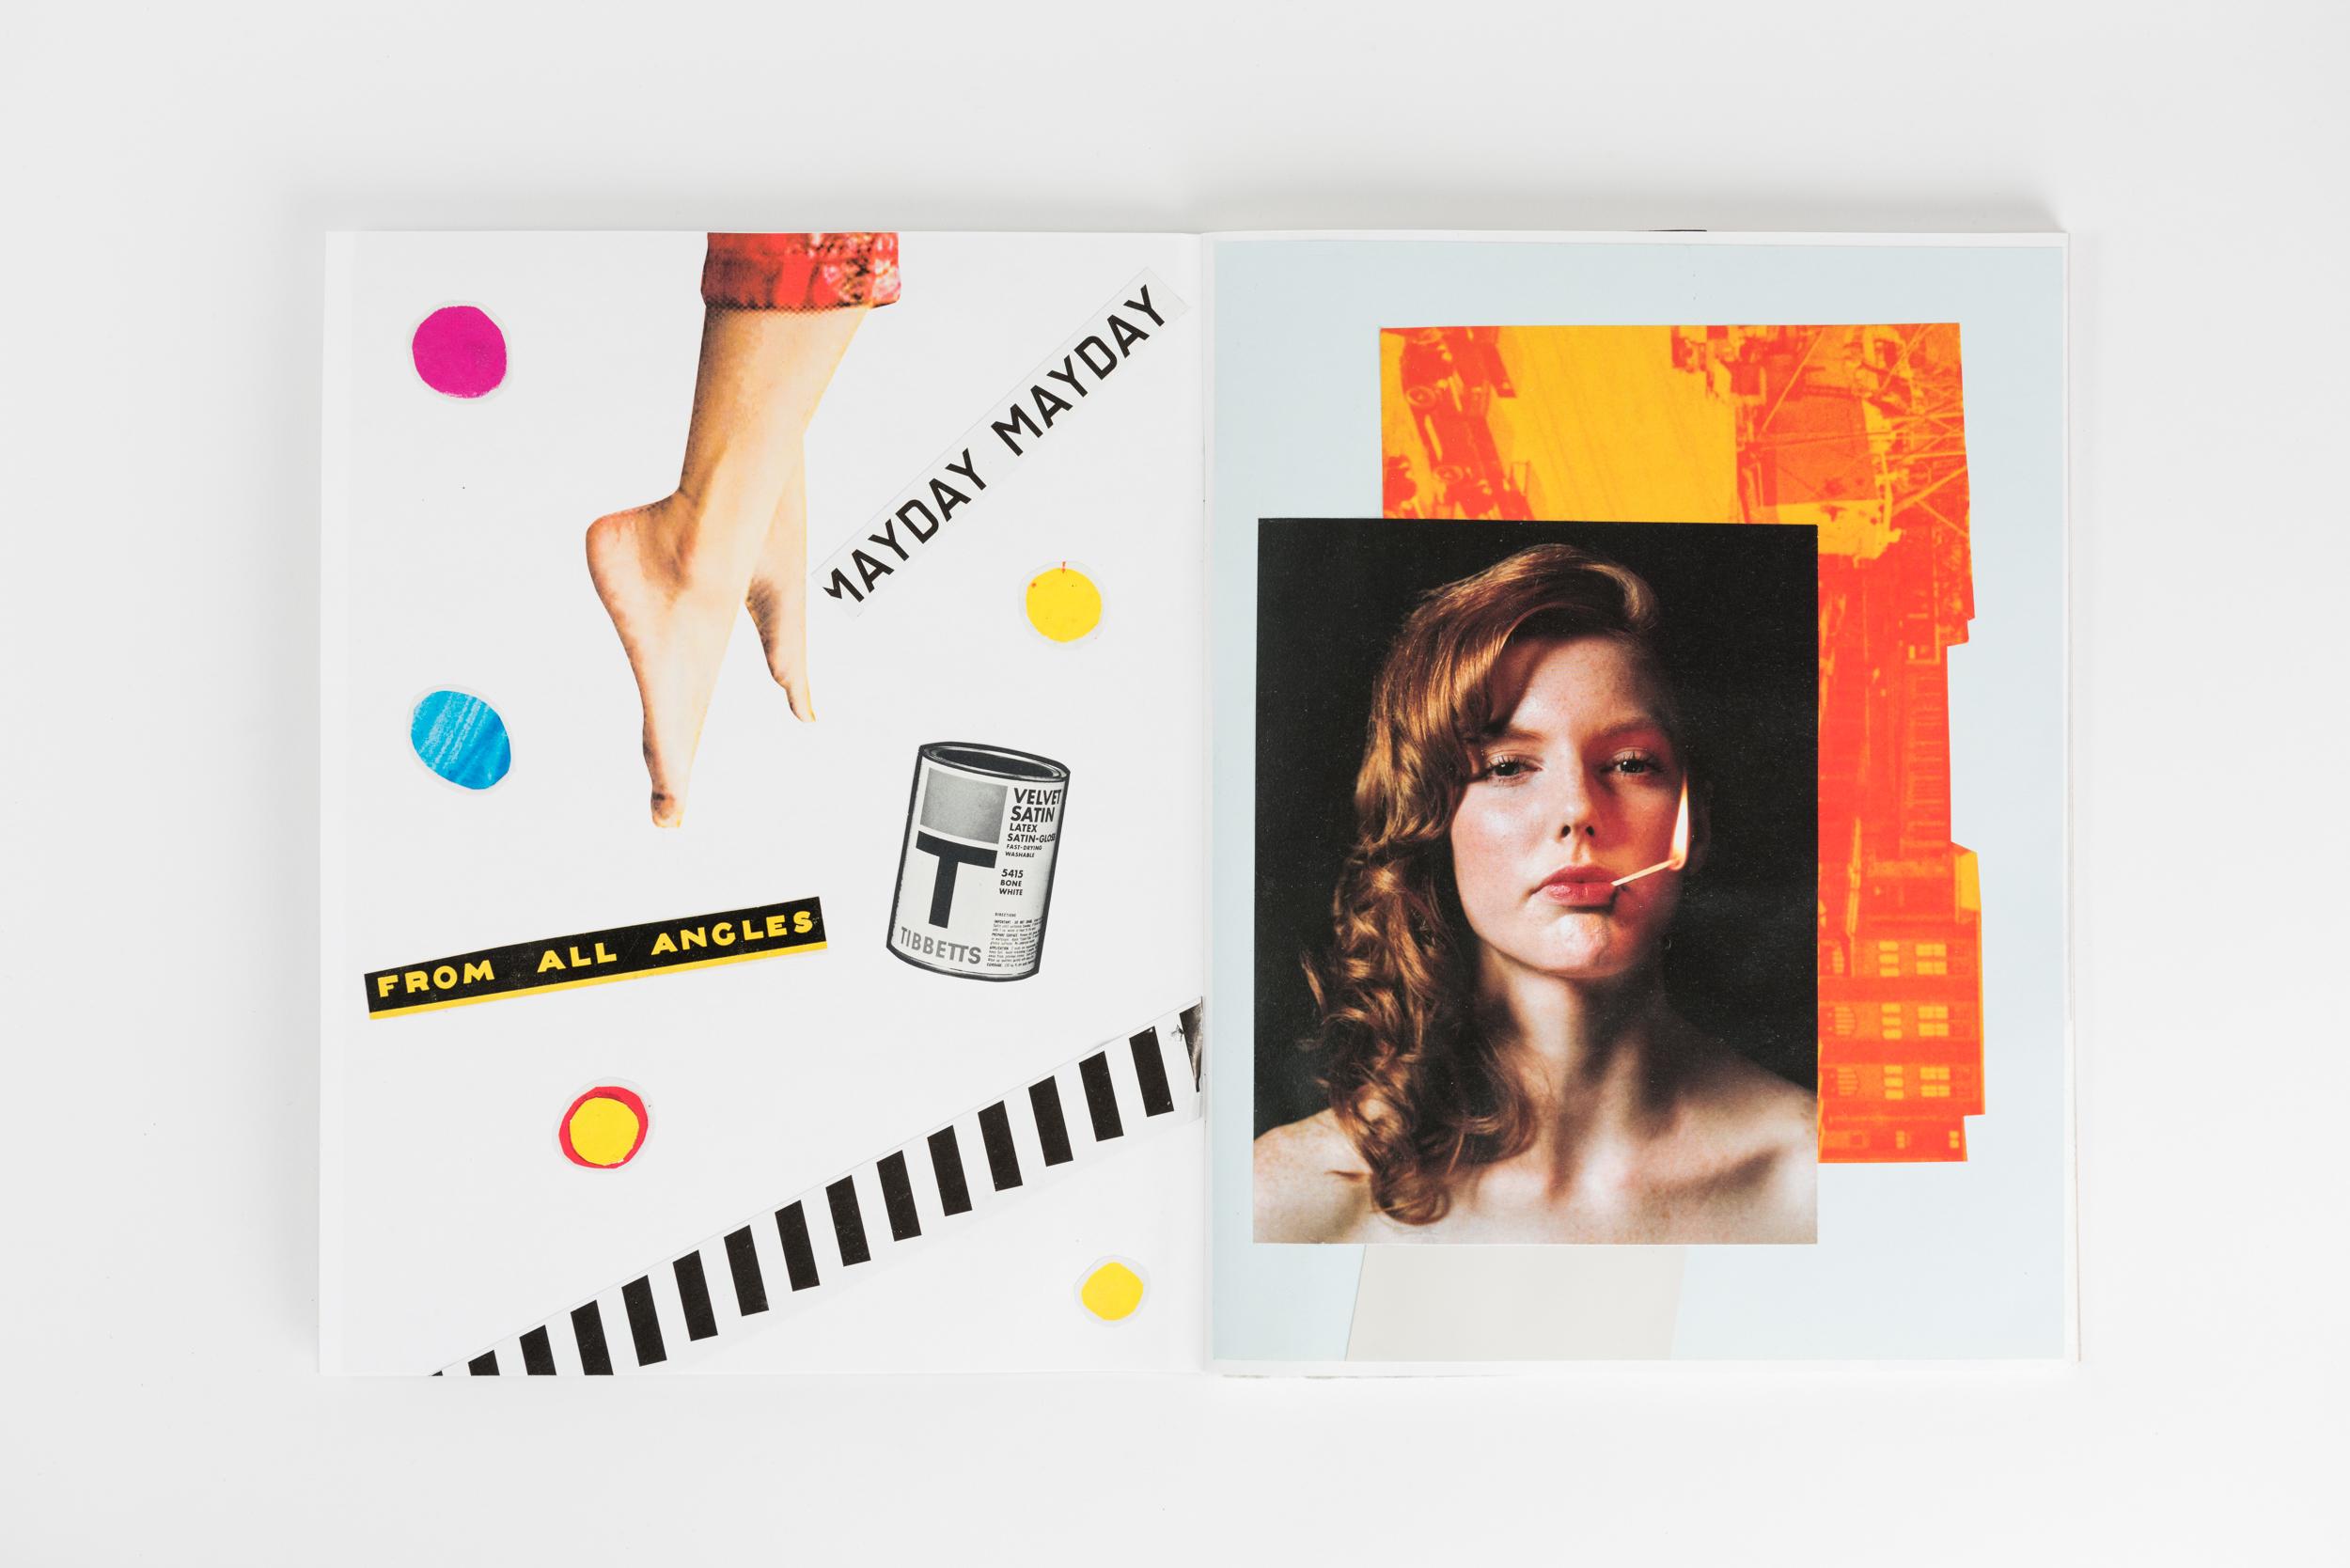 Sketchbook     Sketchbook collage made using magazines, books, etc.